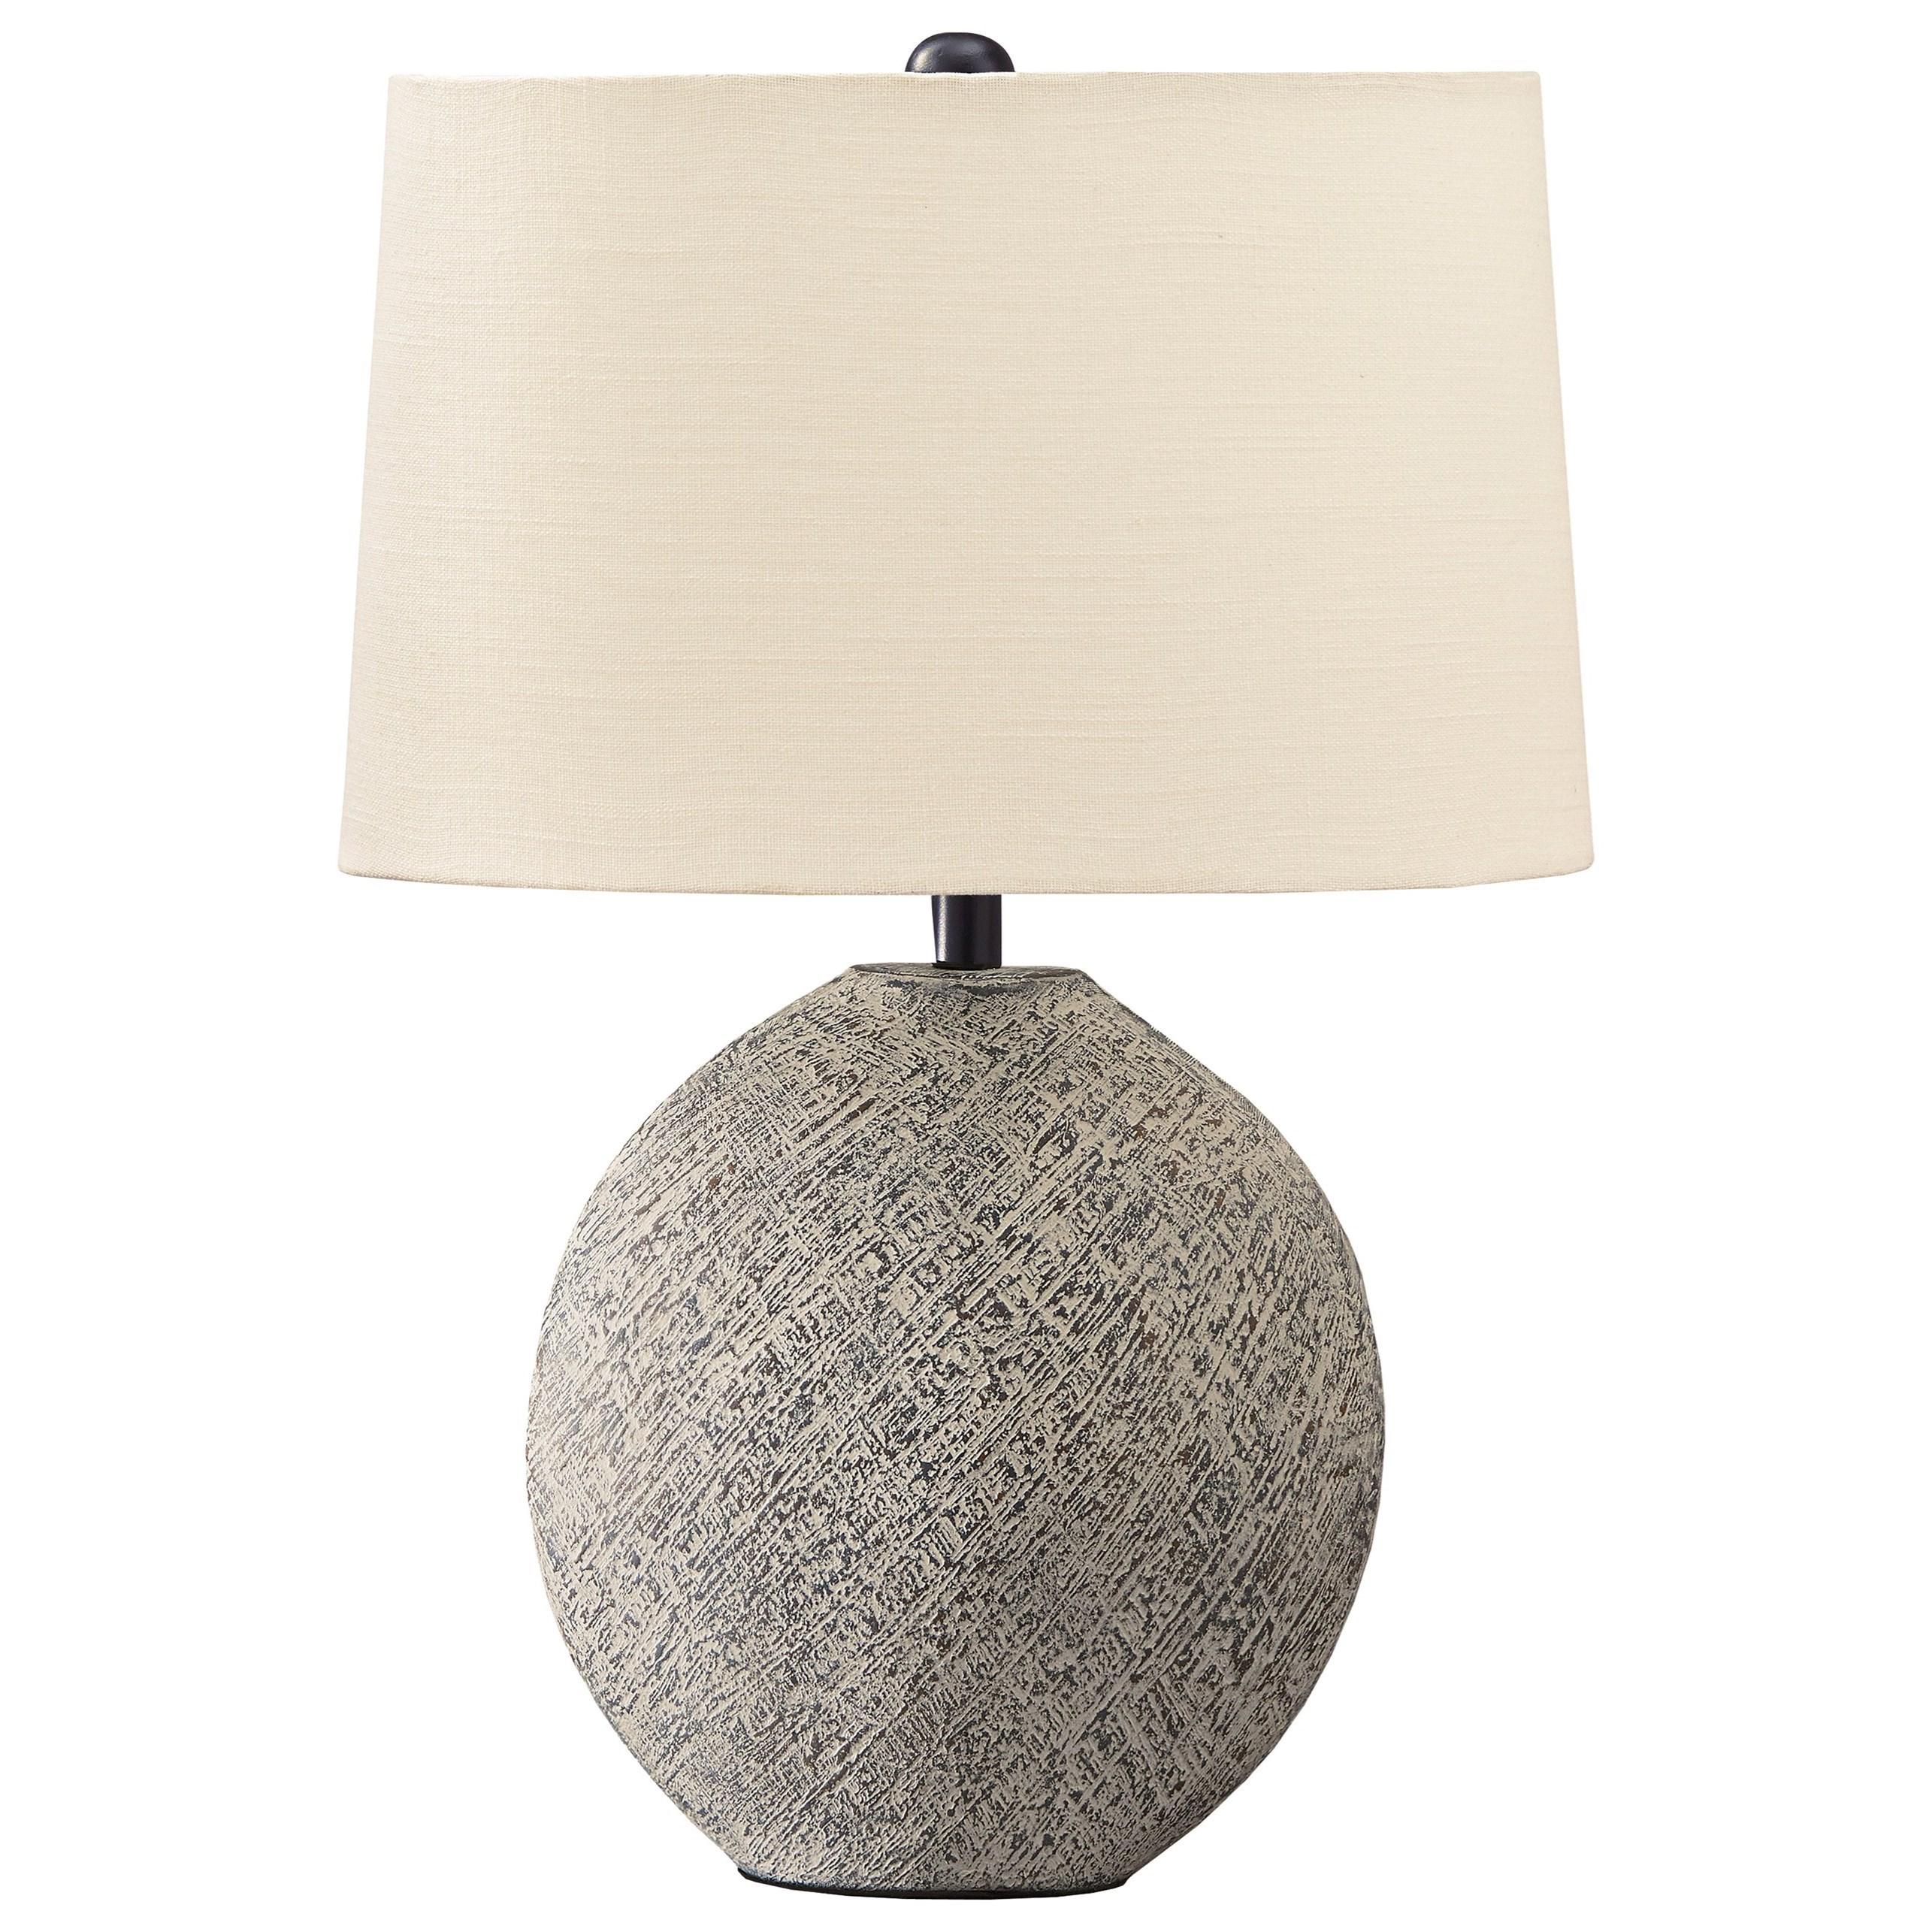 Harif Beige Table Lamp